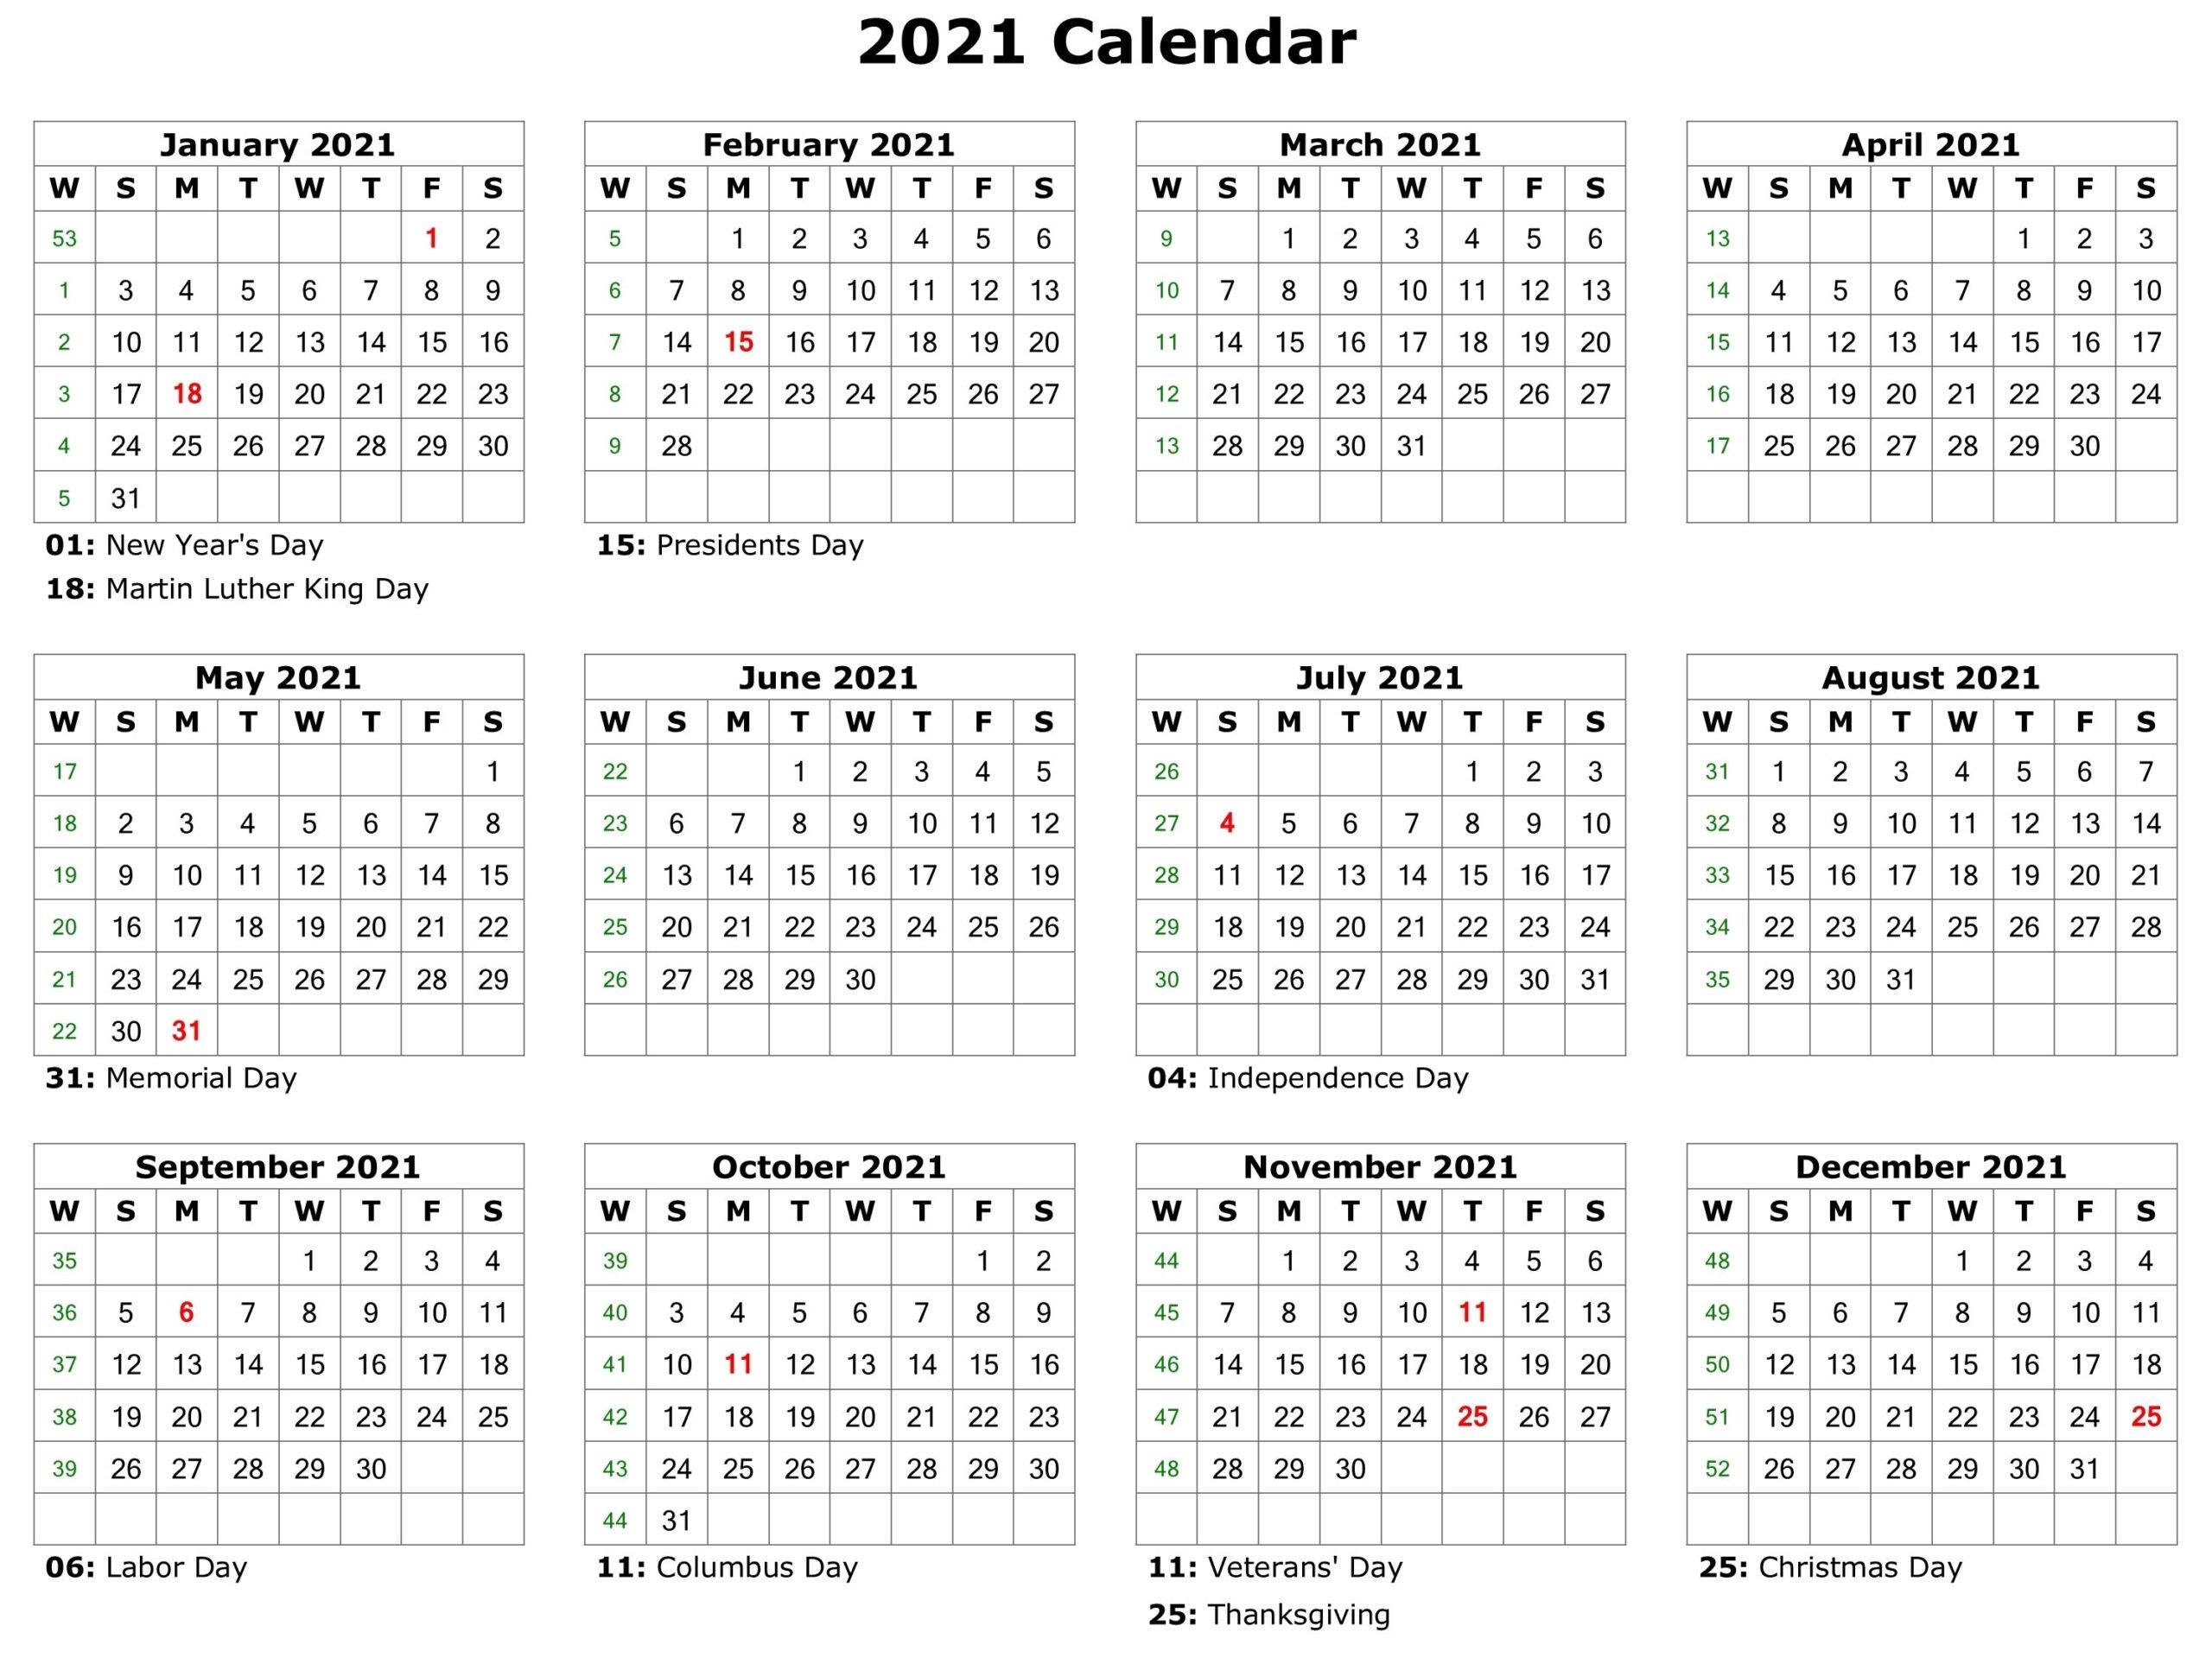 2021 Printable Calendar | Printable Calendar Template throughout 2021 Monthly Planner 12 Month